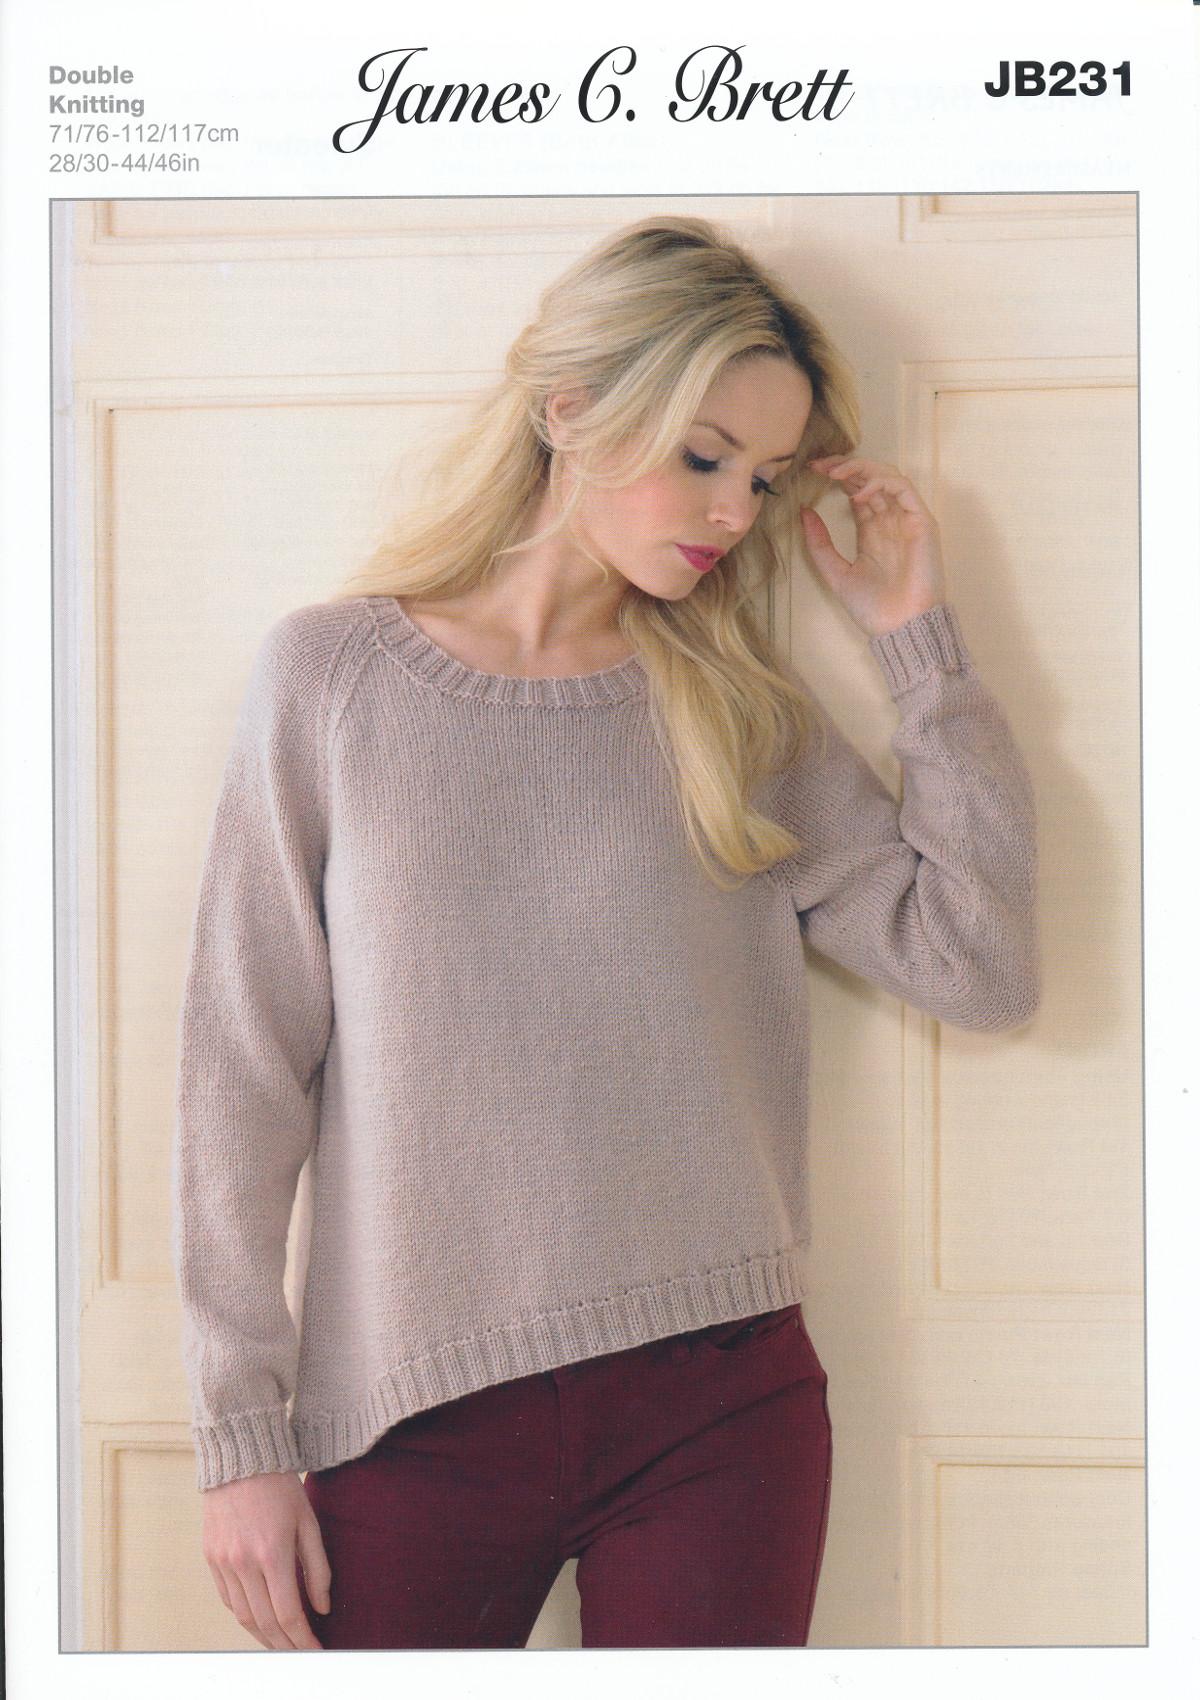 e9e0ee59b698 Womens Double Knitting Legacy DK Pattern Ladies Long Sleeve Ribbed ...